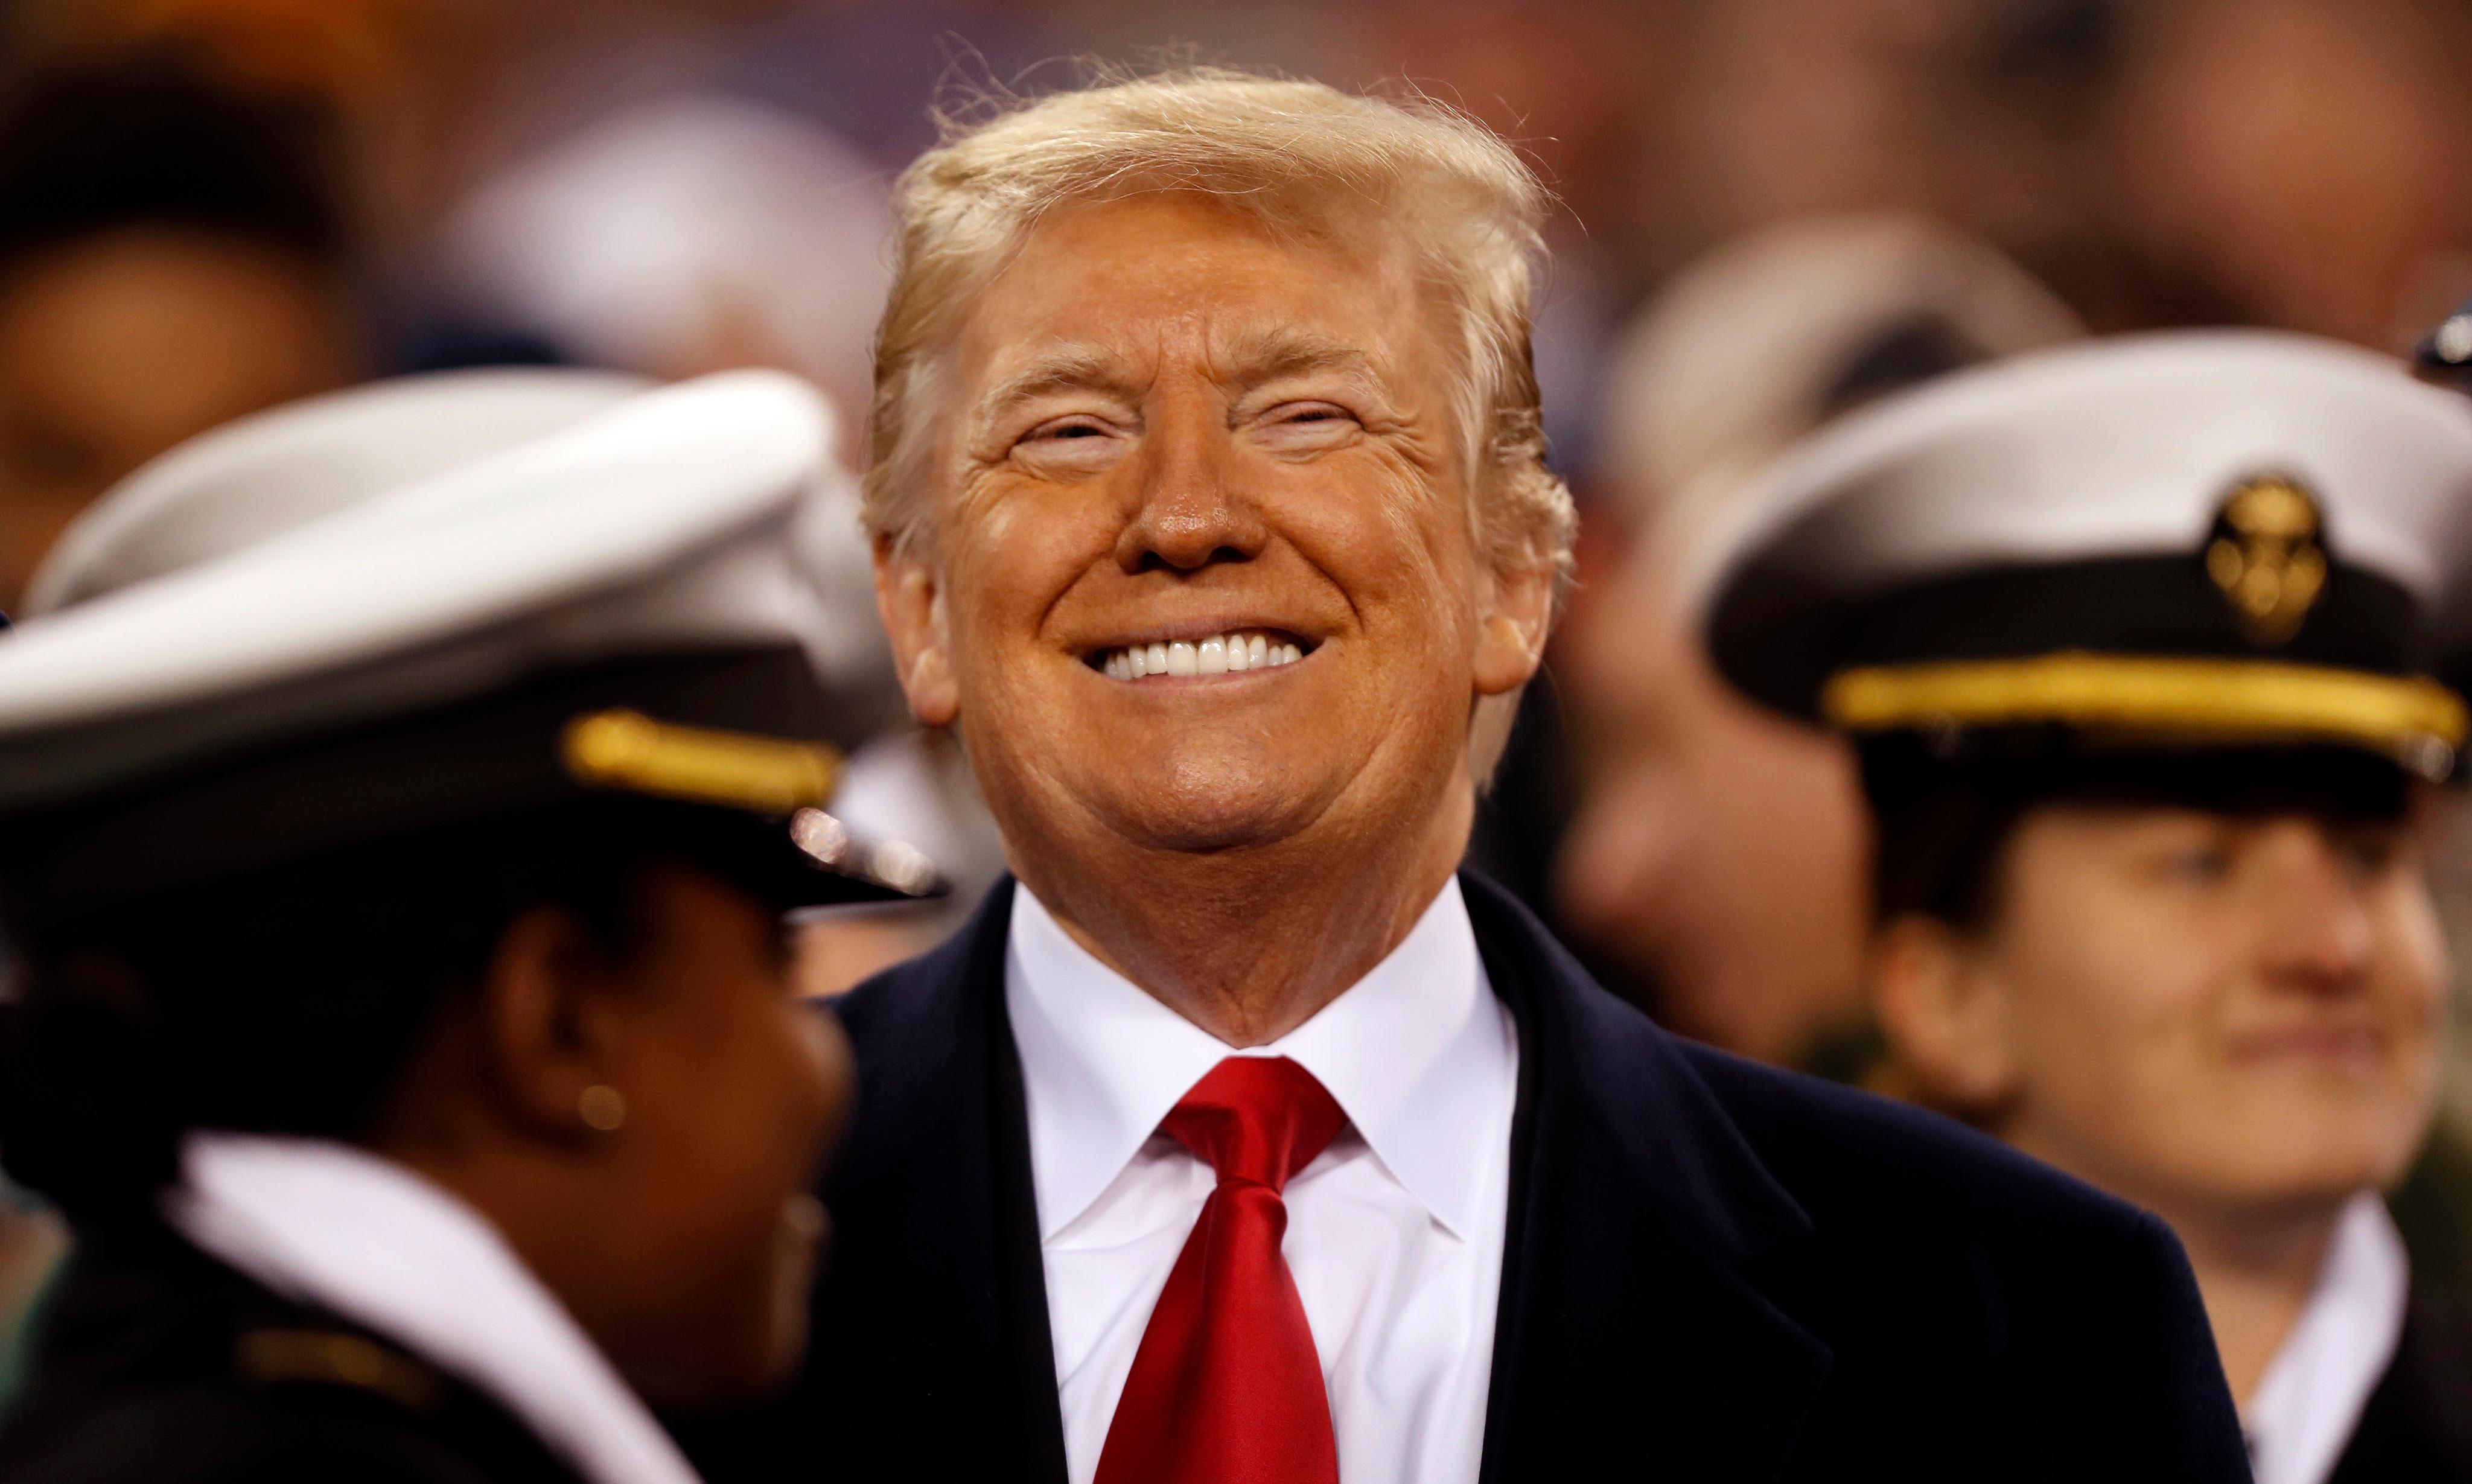 Trump's China tariffs are a regressive tax on Americans and risk a recession